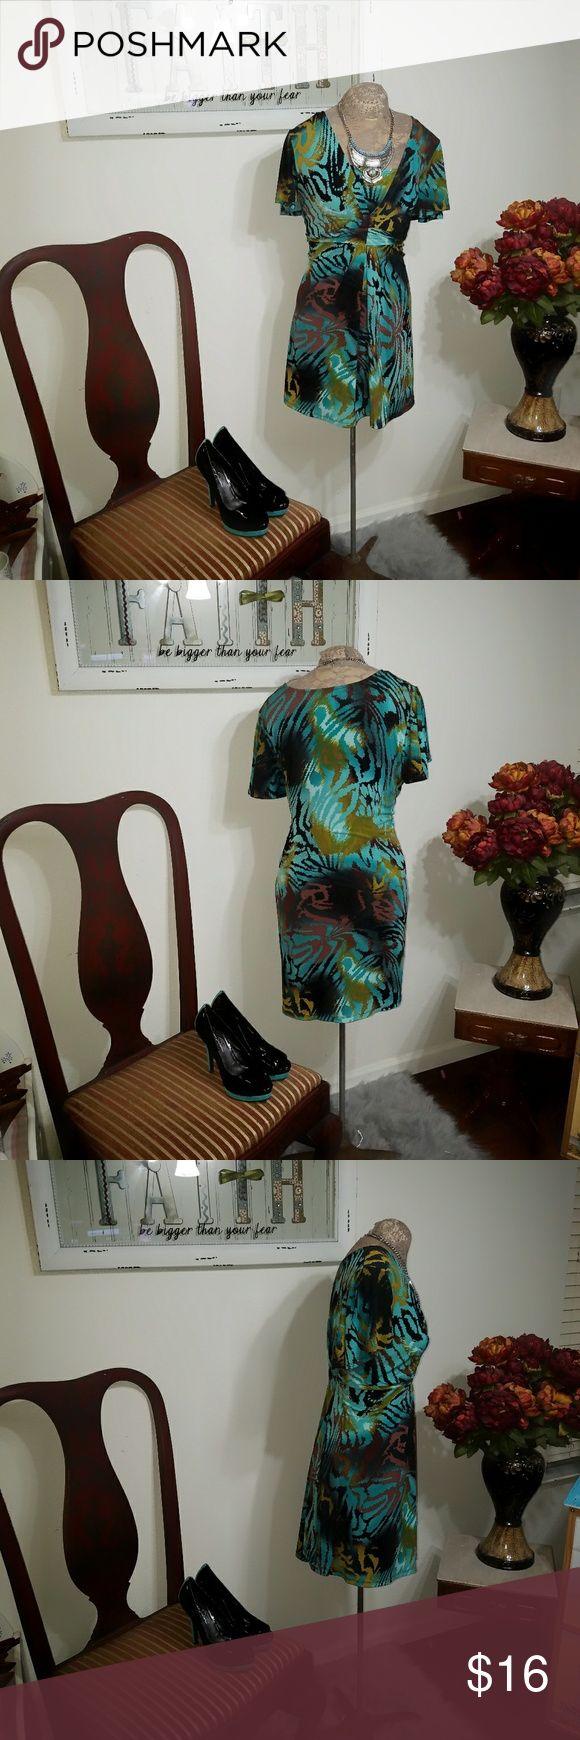 Alfani women knee length dress Like new condition 95 % polyester 5% spandex Alfani Dresses Midi